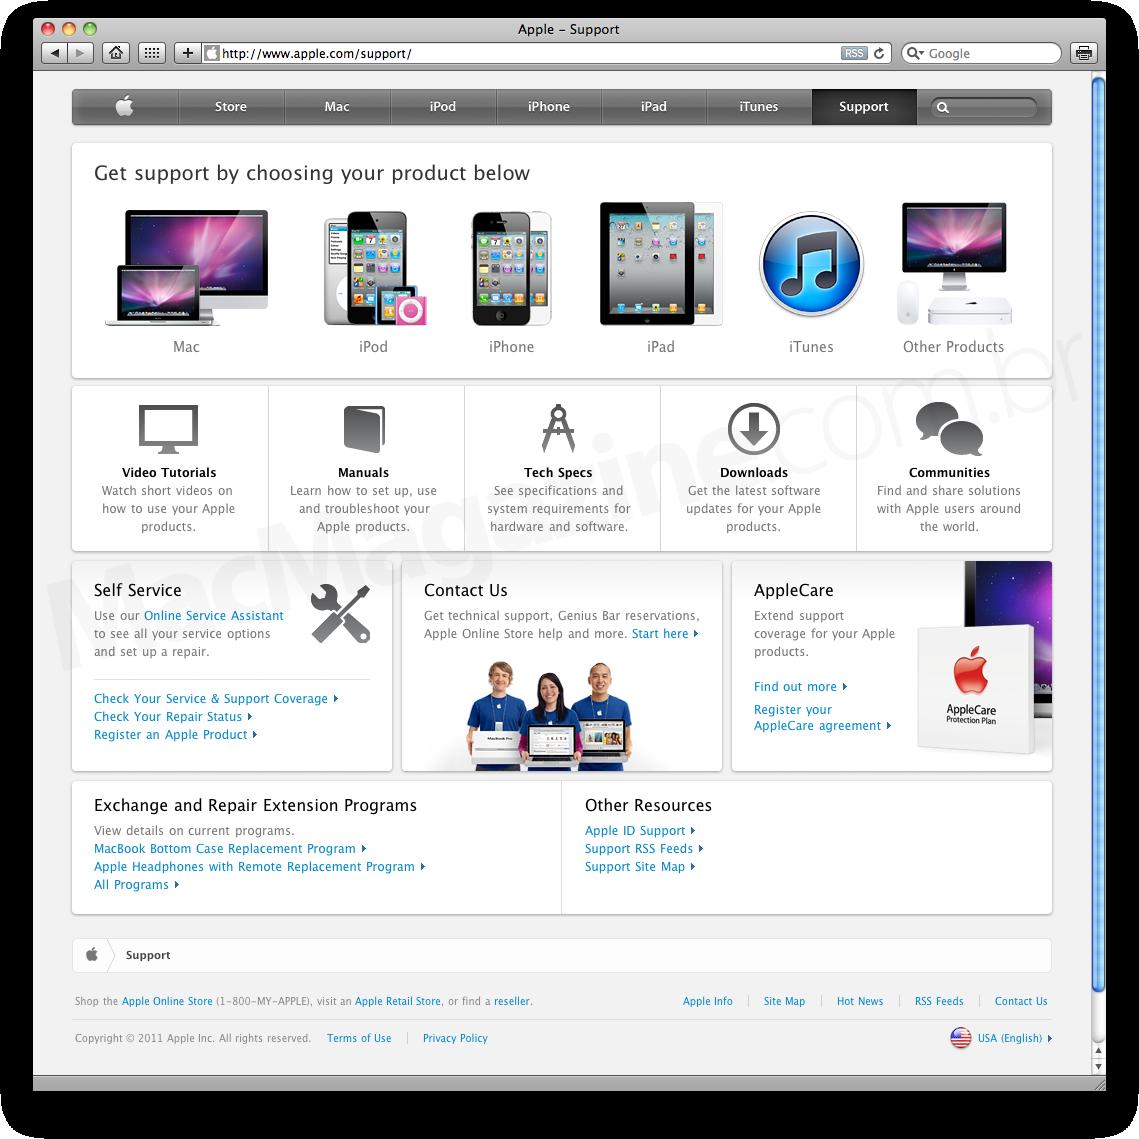 Página Apple - Support